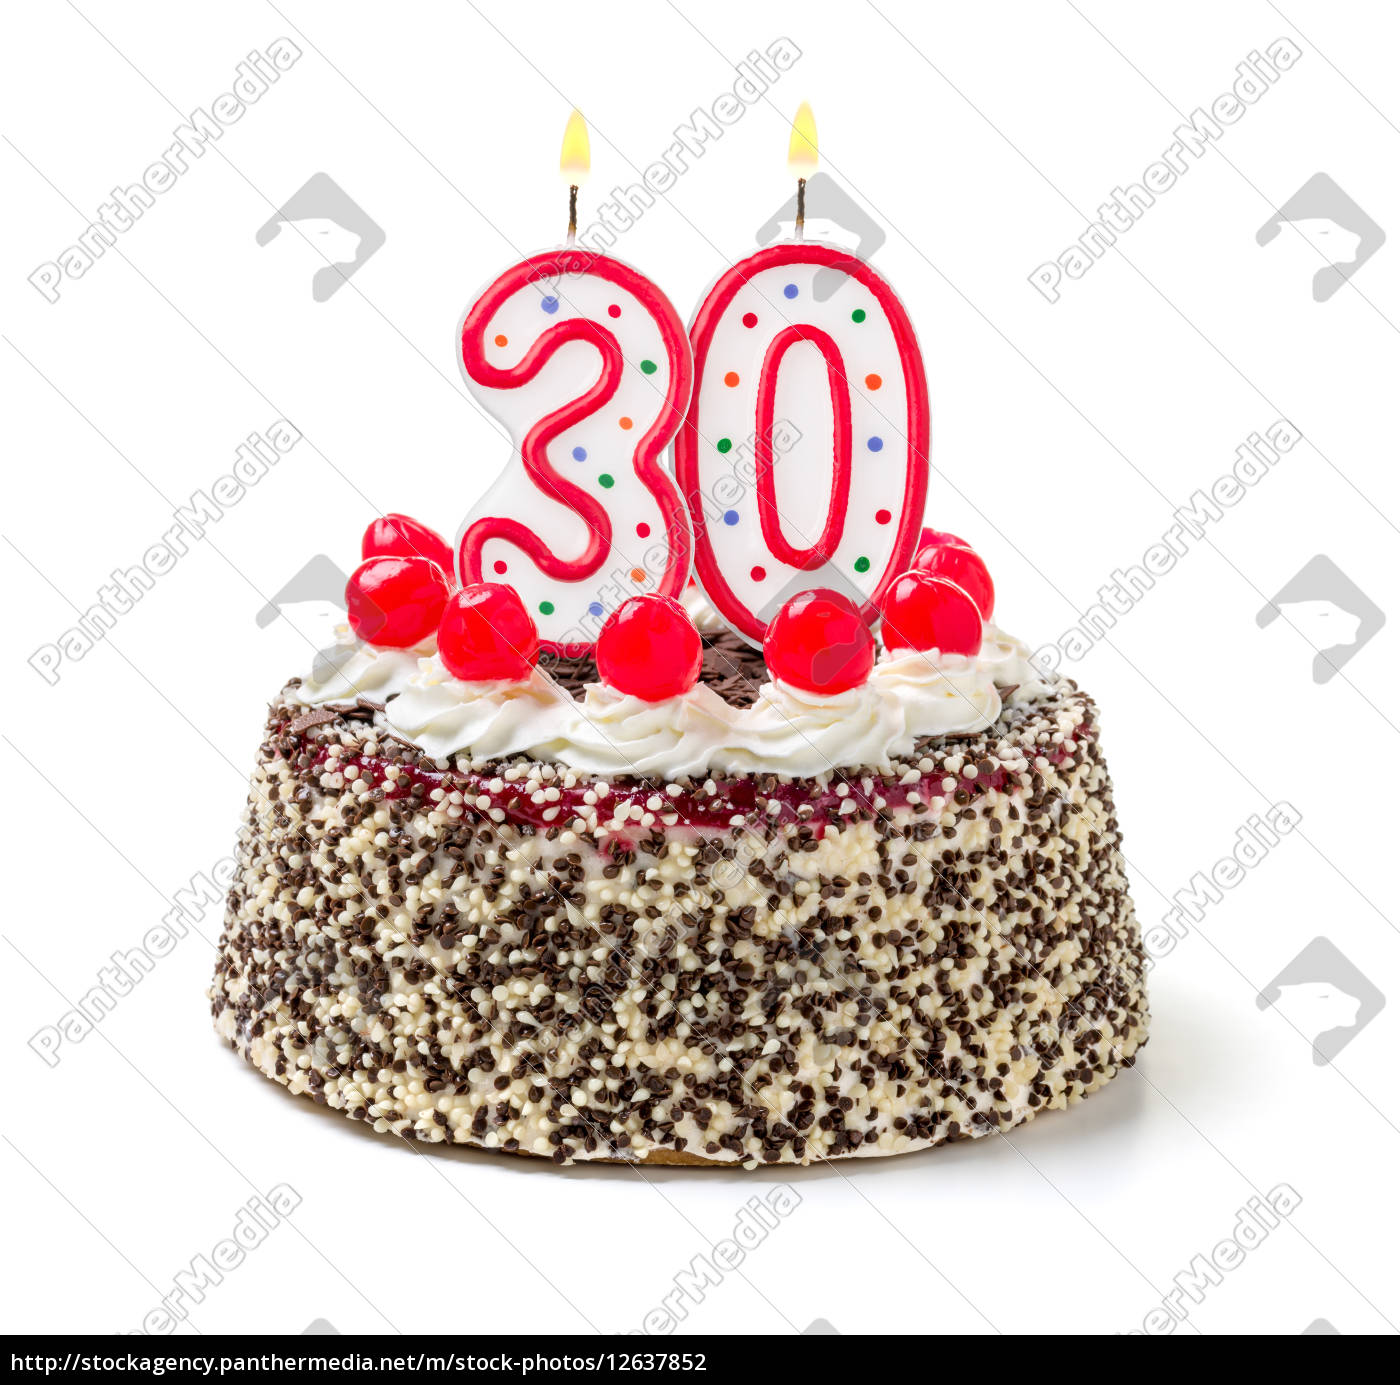 Stupendous Birthday Cake With Burning Candle Number 30 Royalty Free Photo Birthday Cards Printable Giouspongecafe Filternl